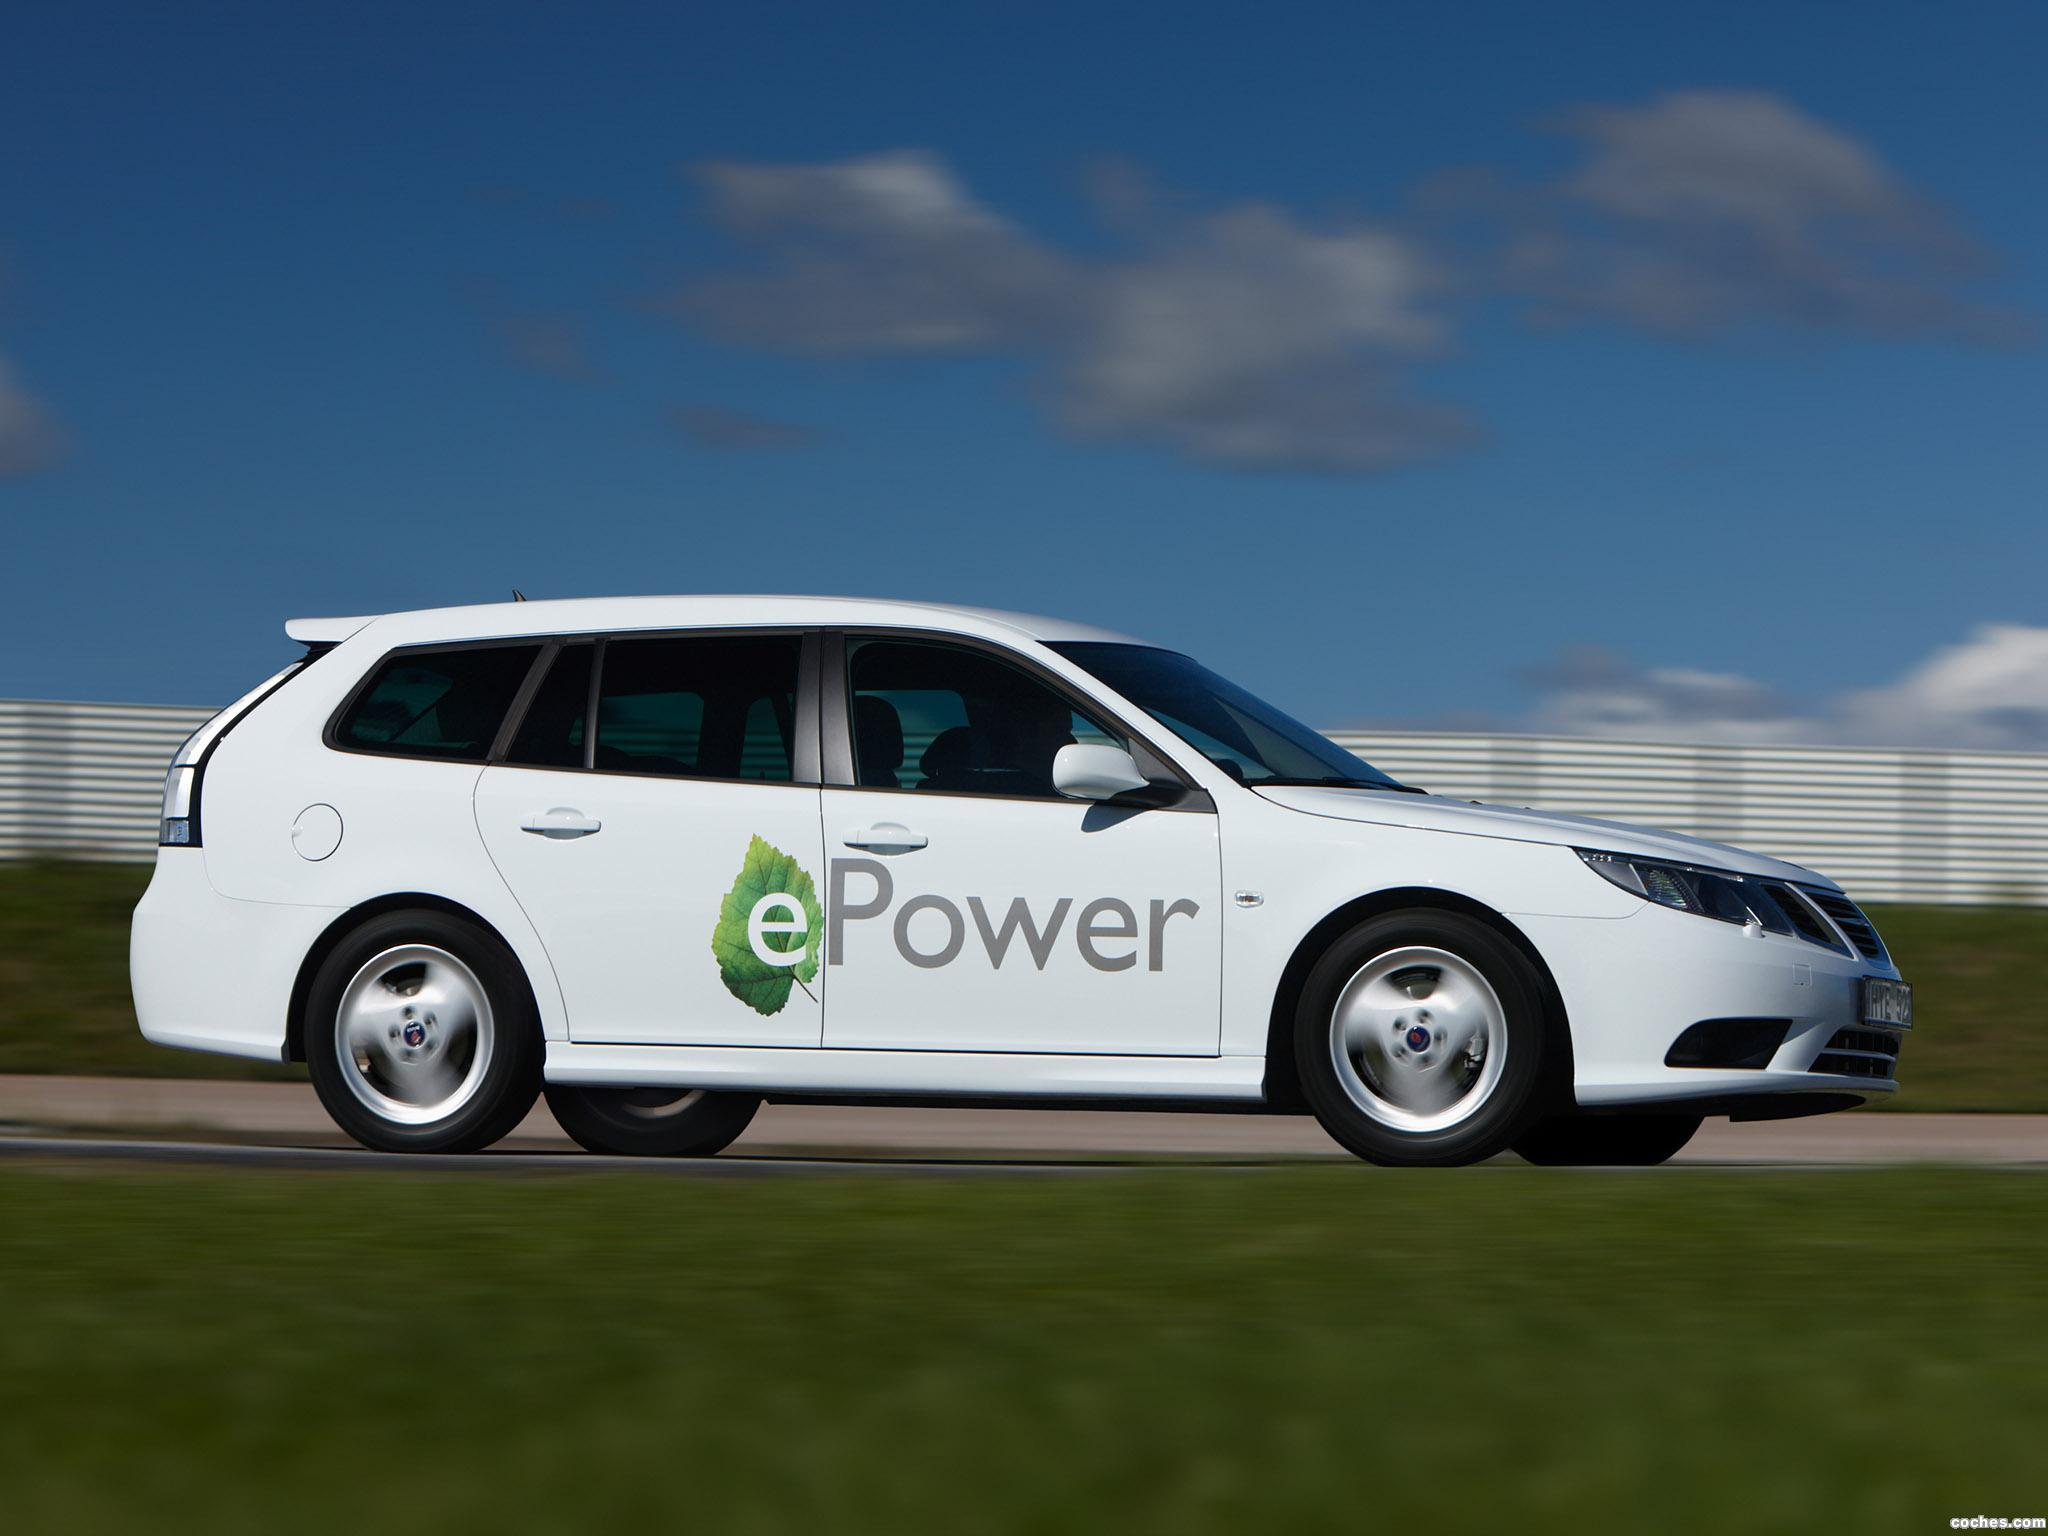 Foto 2 de Saab 9-3 ePower Concept 2010